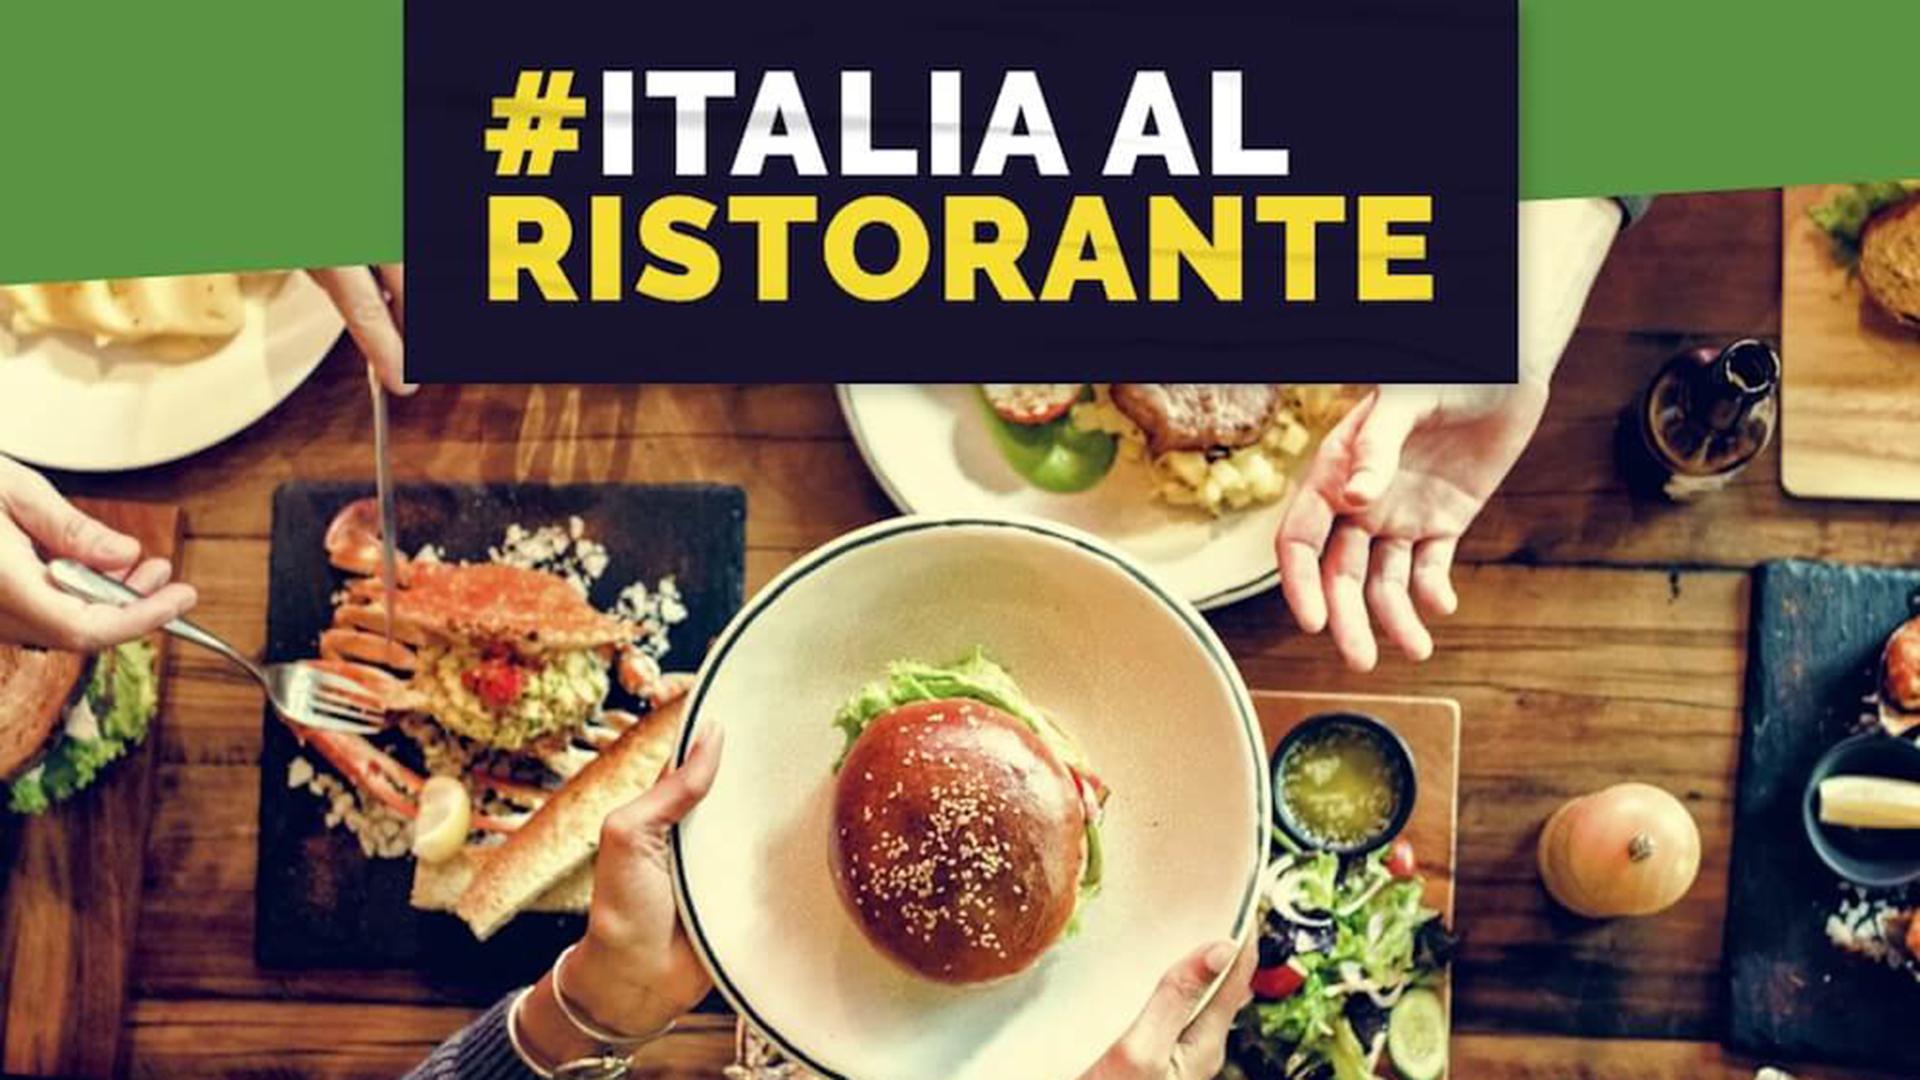 TheFork-Italia-al-ristorante